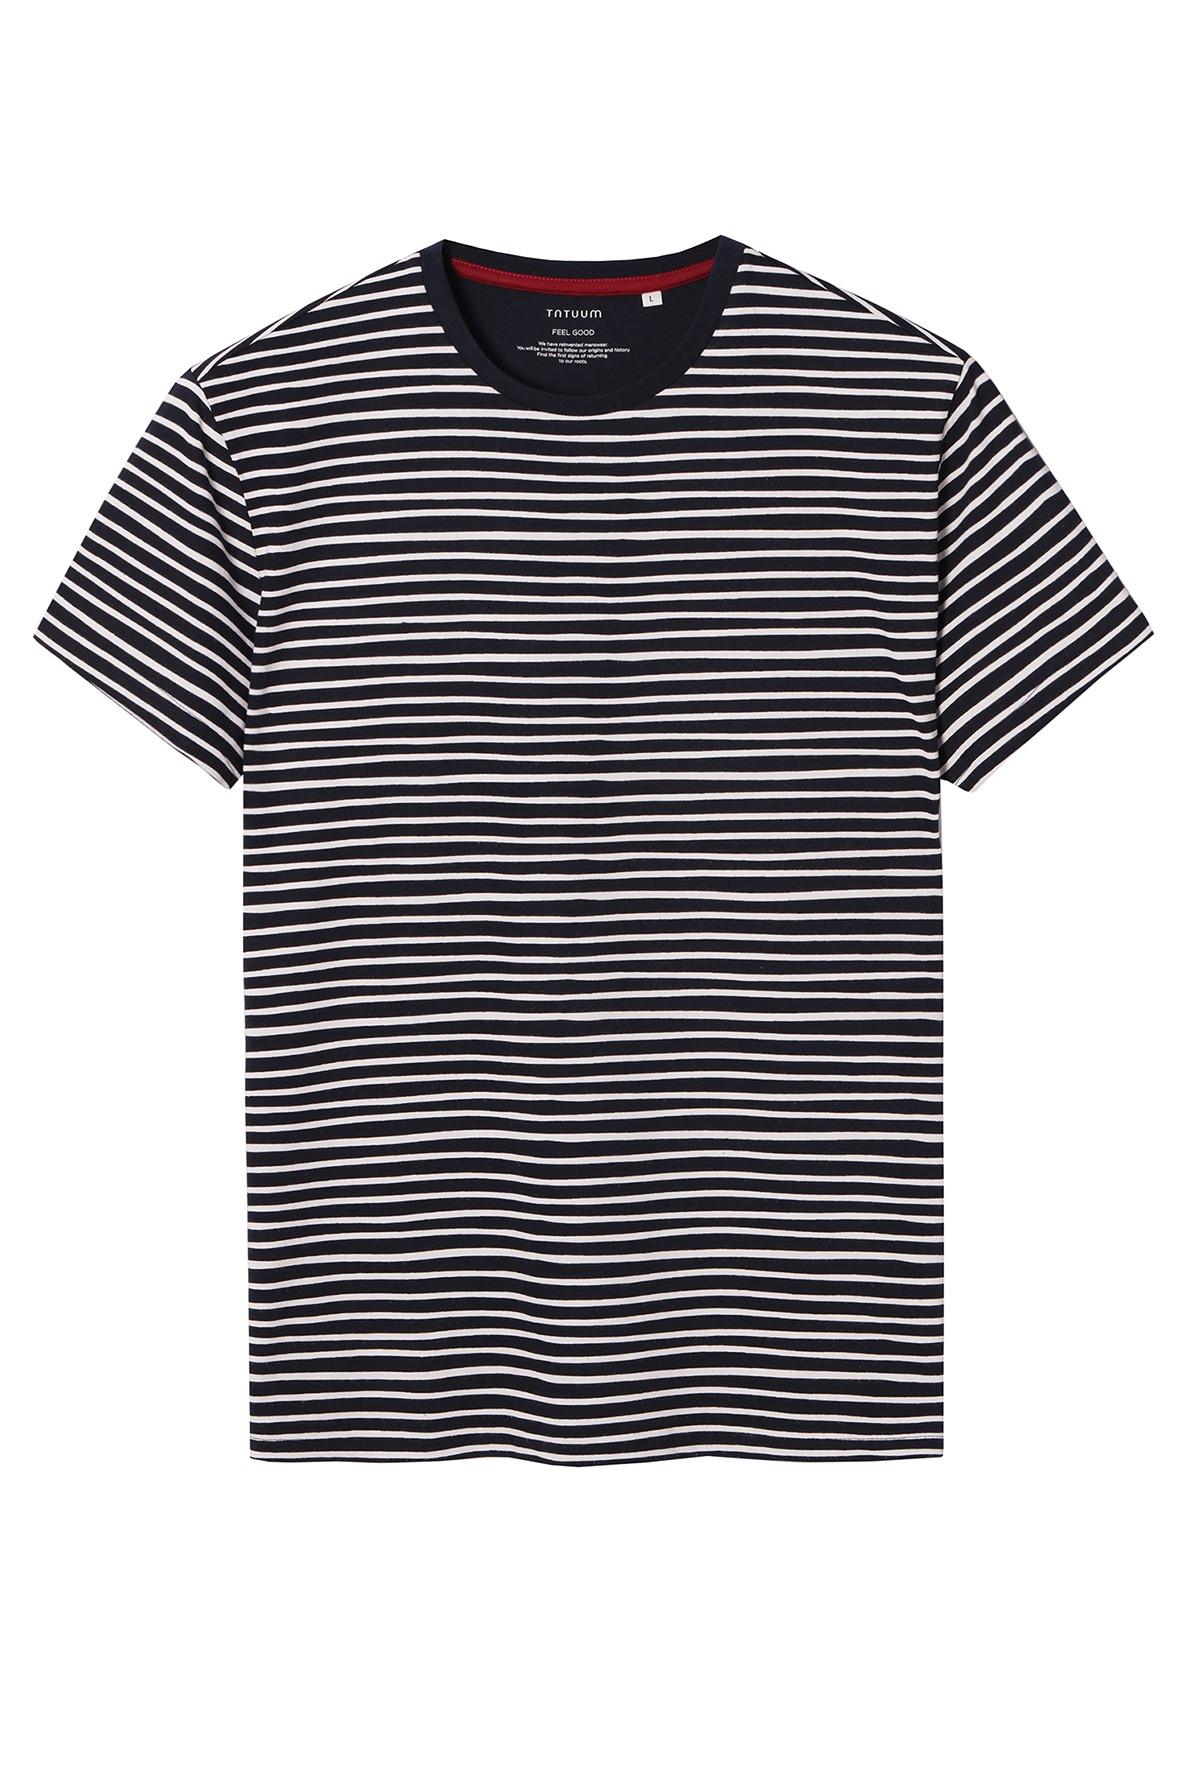 Bawełniany t-shirt męski w paski Tatuum